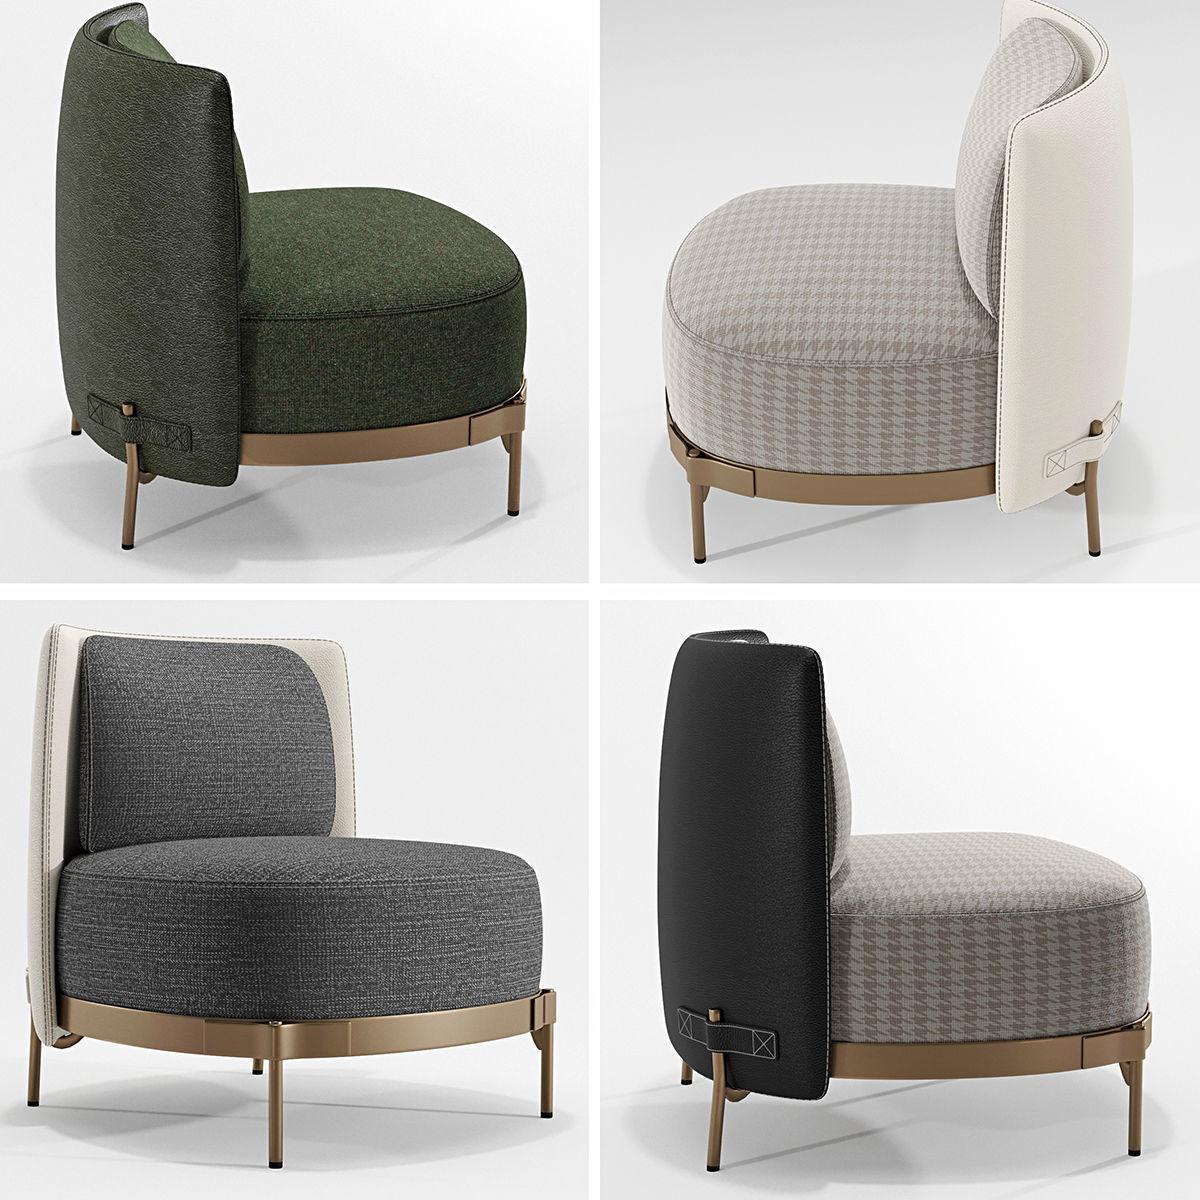 3D Minotti Tape armchairs | CGTrader